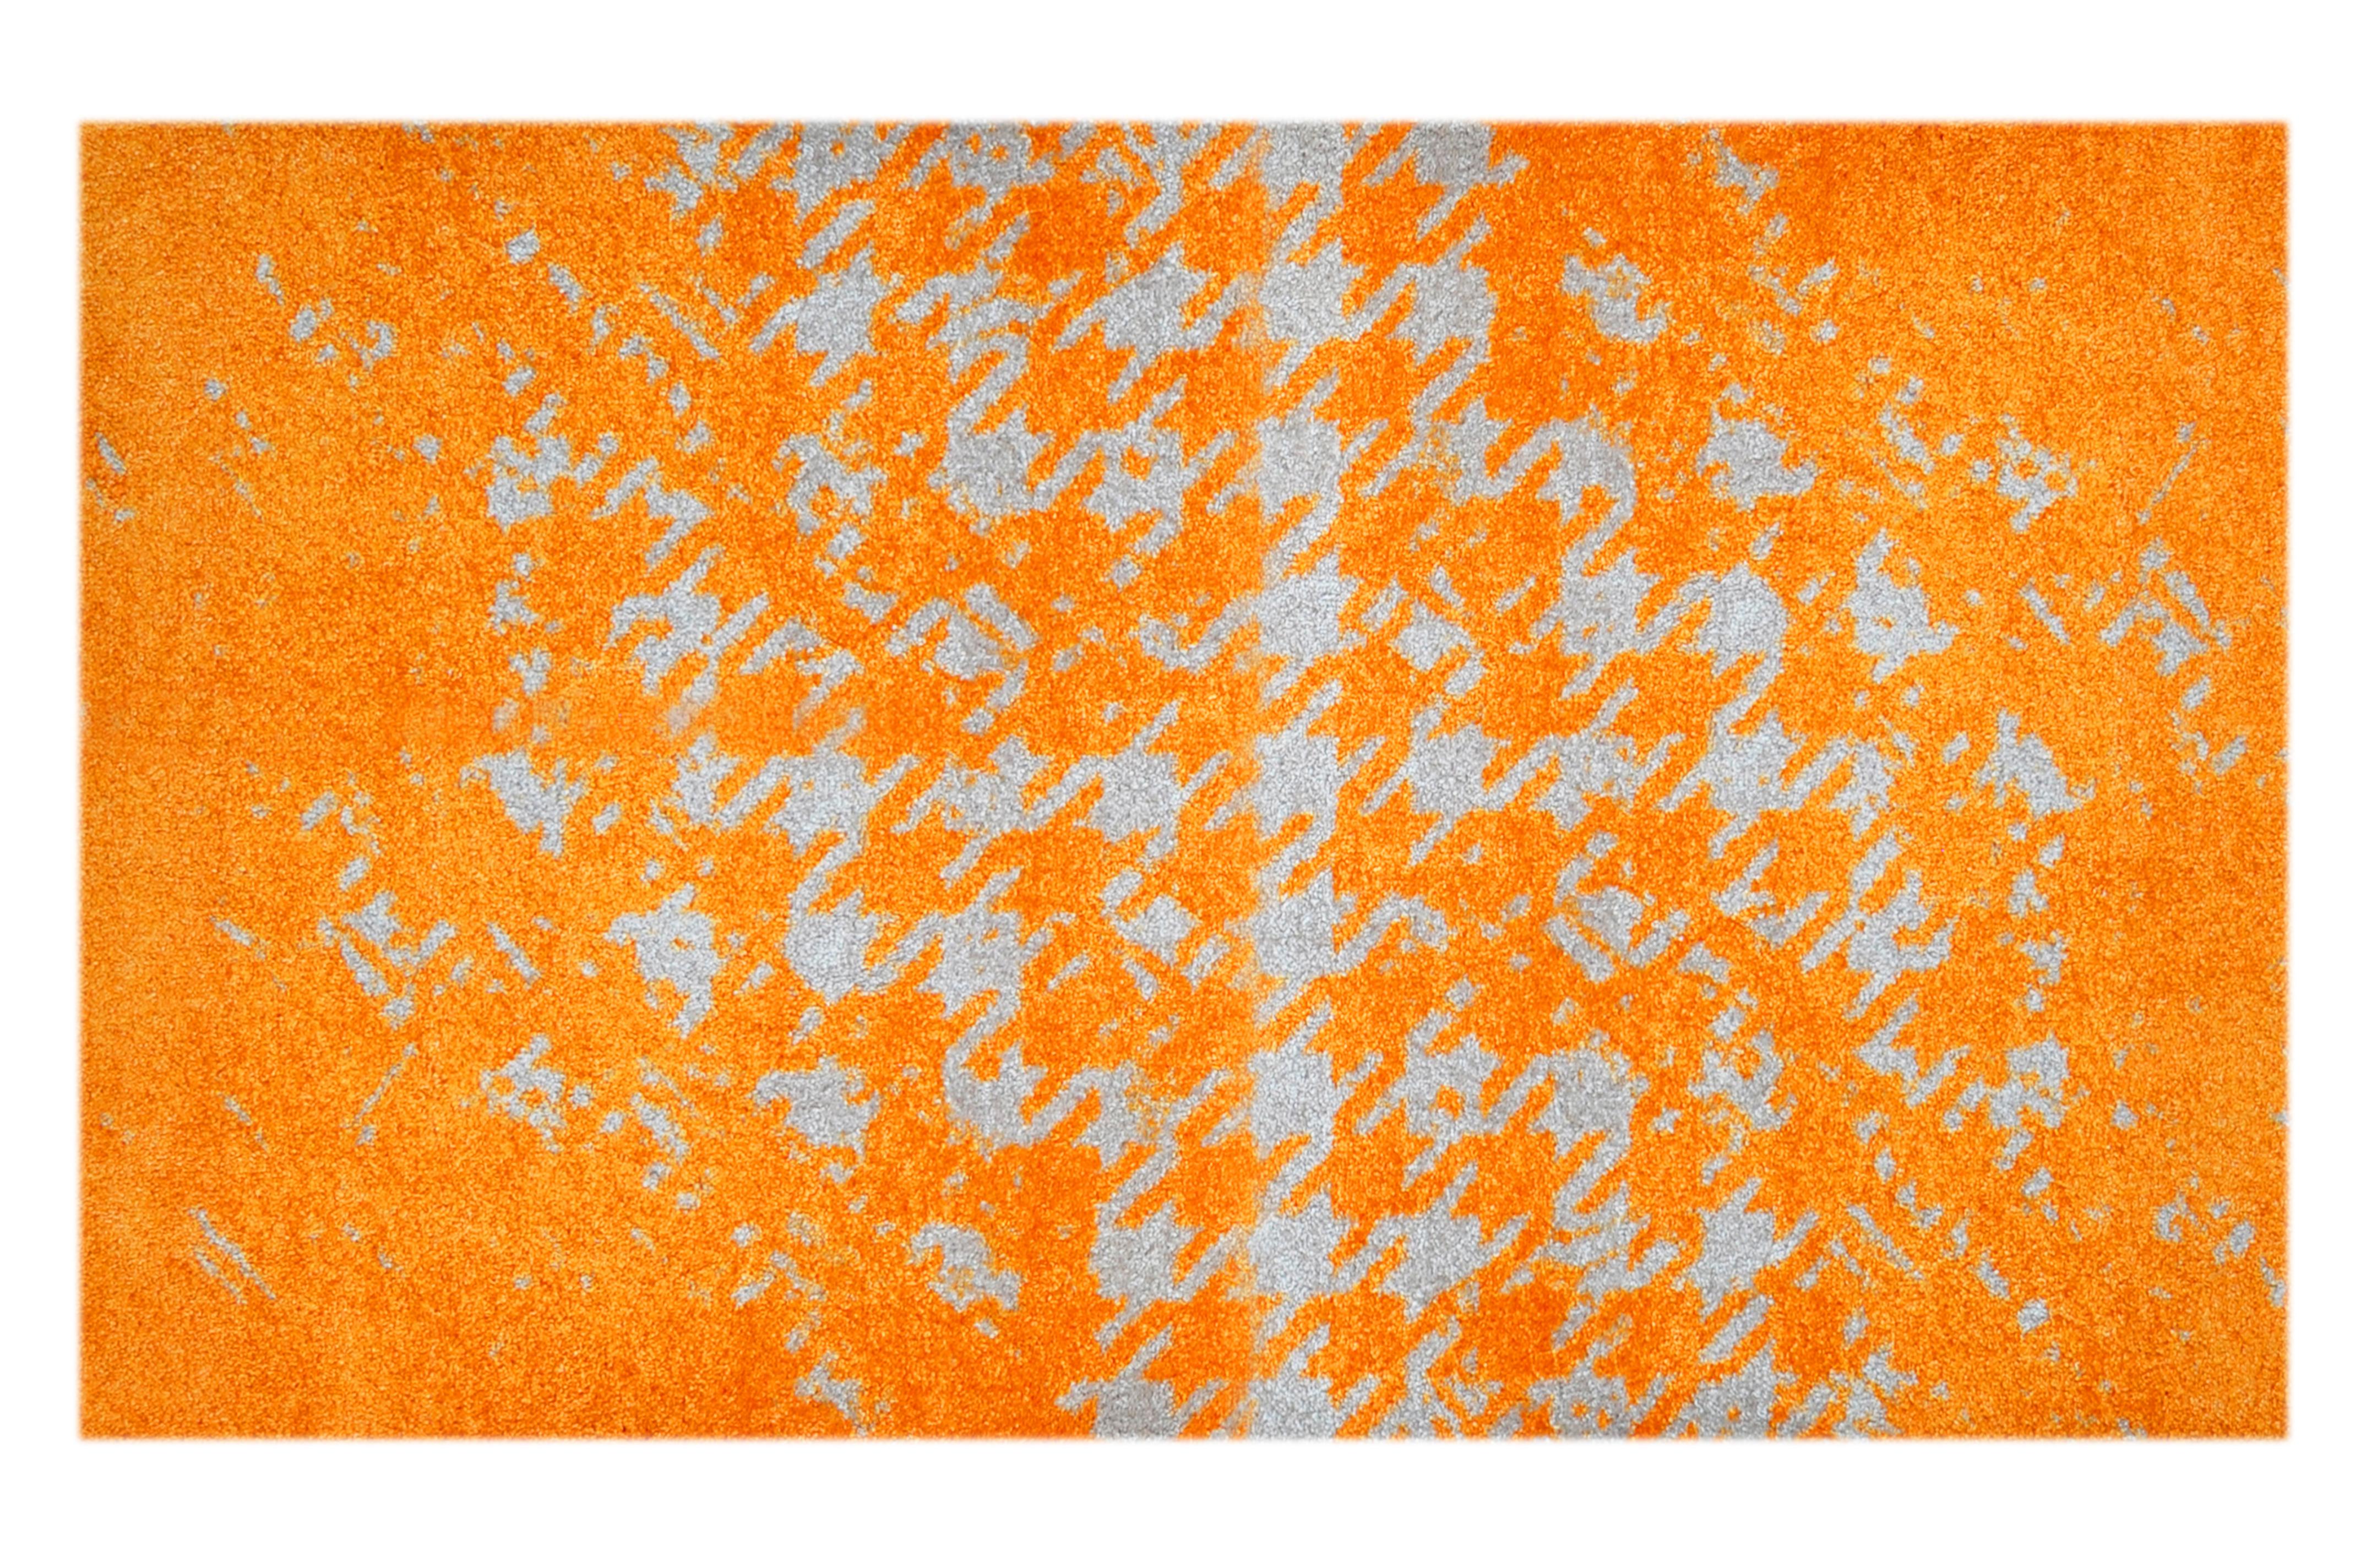 "Fußmatte ""Chaos"" orange"